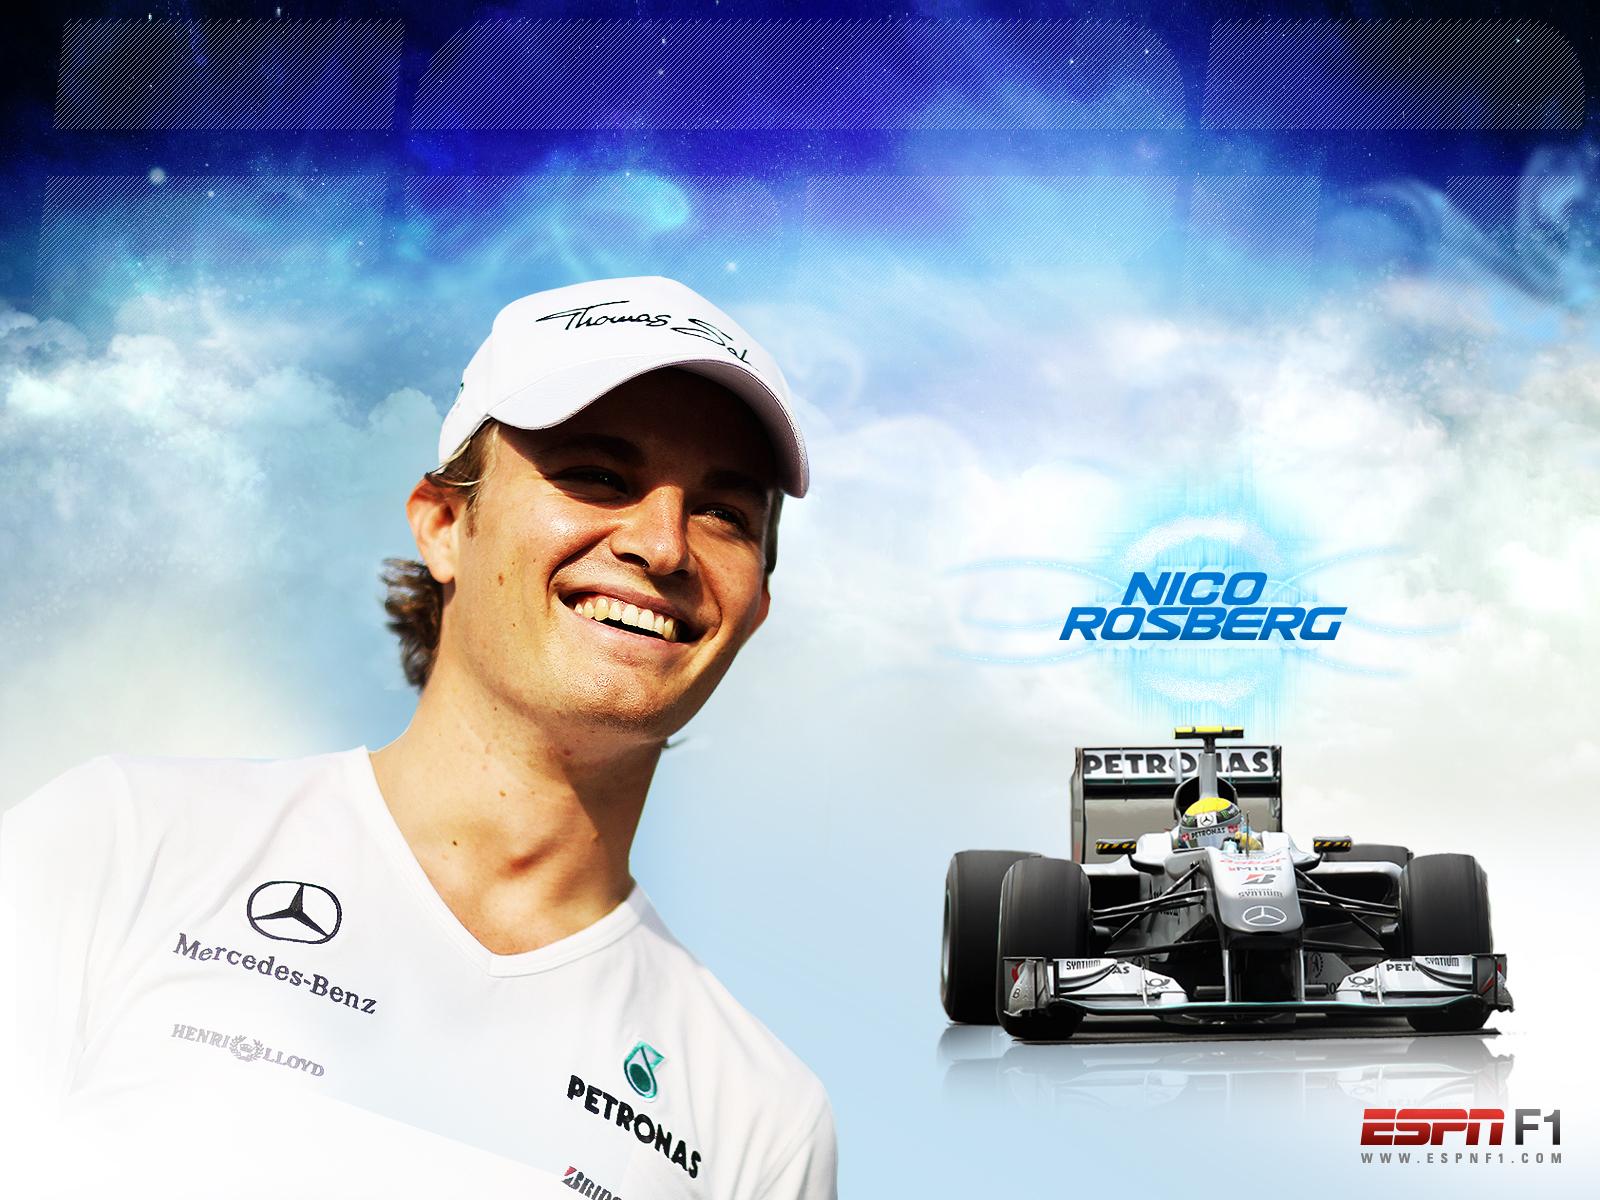 Nico Rosberg 2010